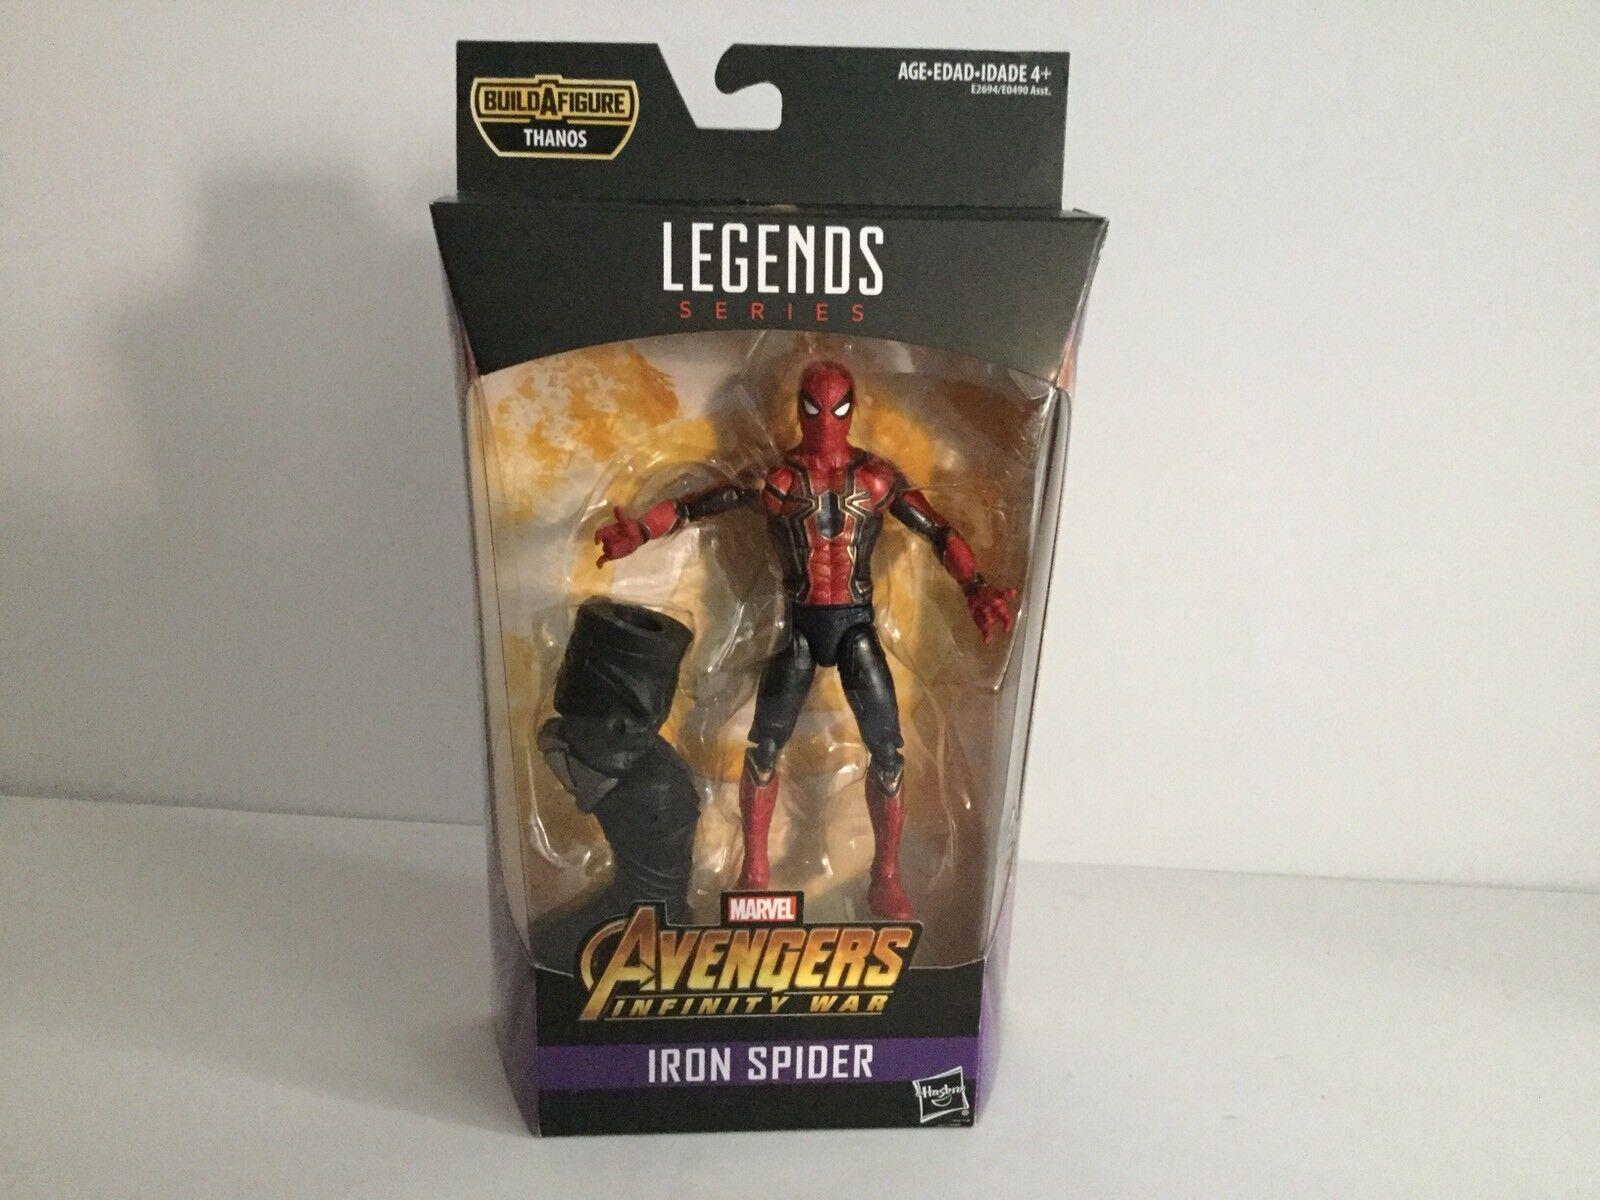 Marvel Legends AVENGERS INFINITY WAR IRON SPIDER SPIDER-MAN Figure MIB